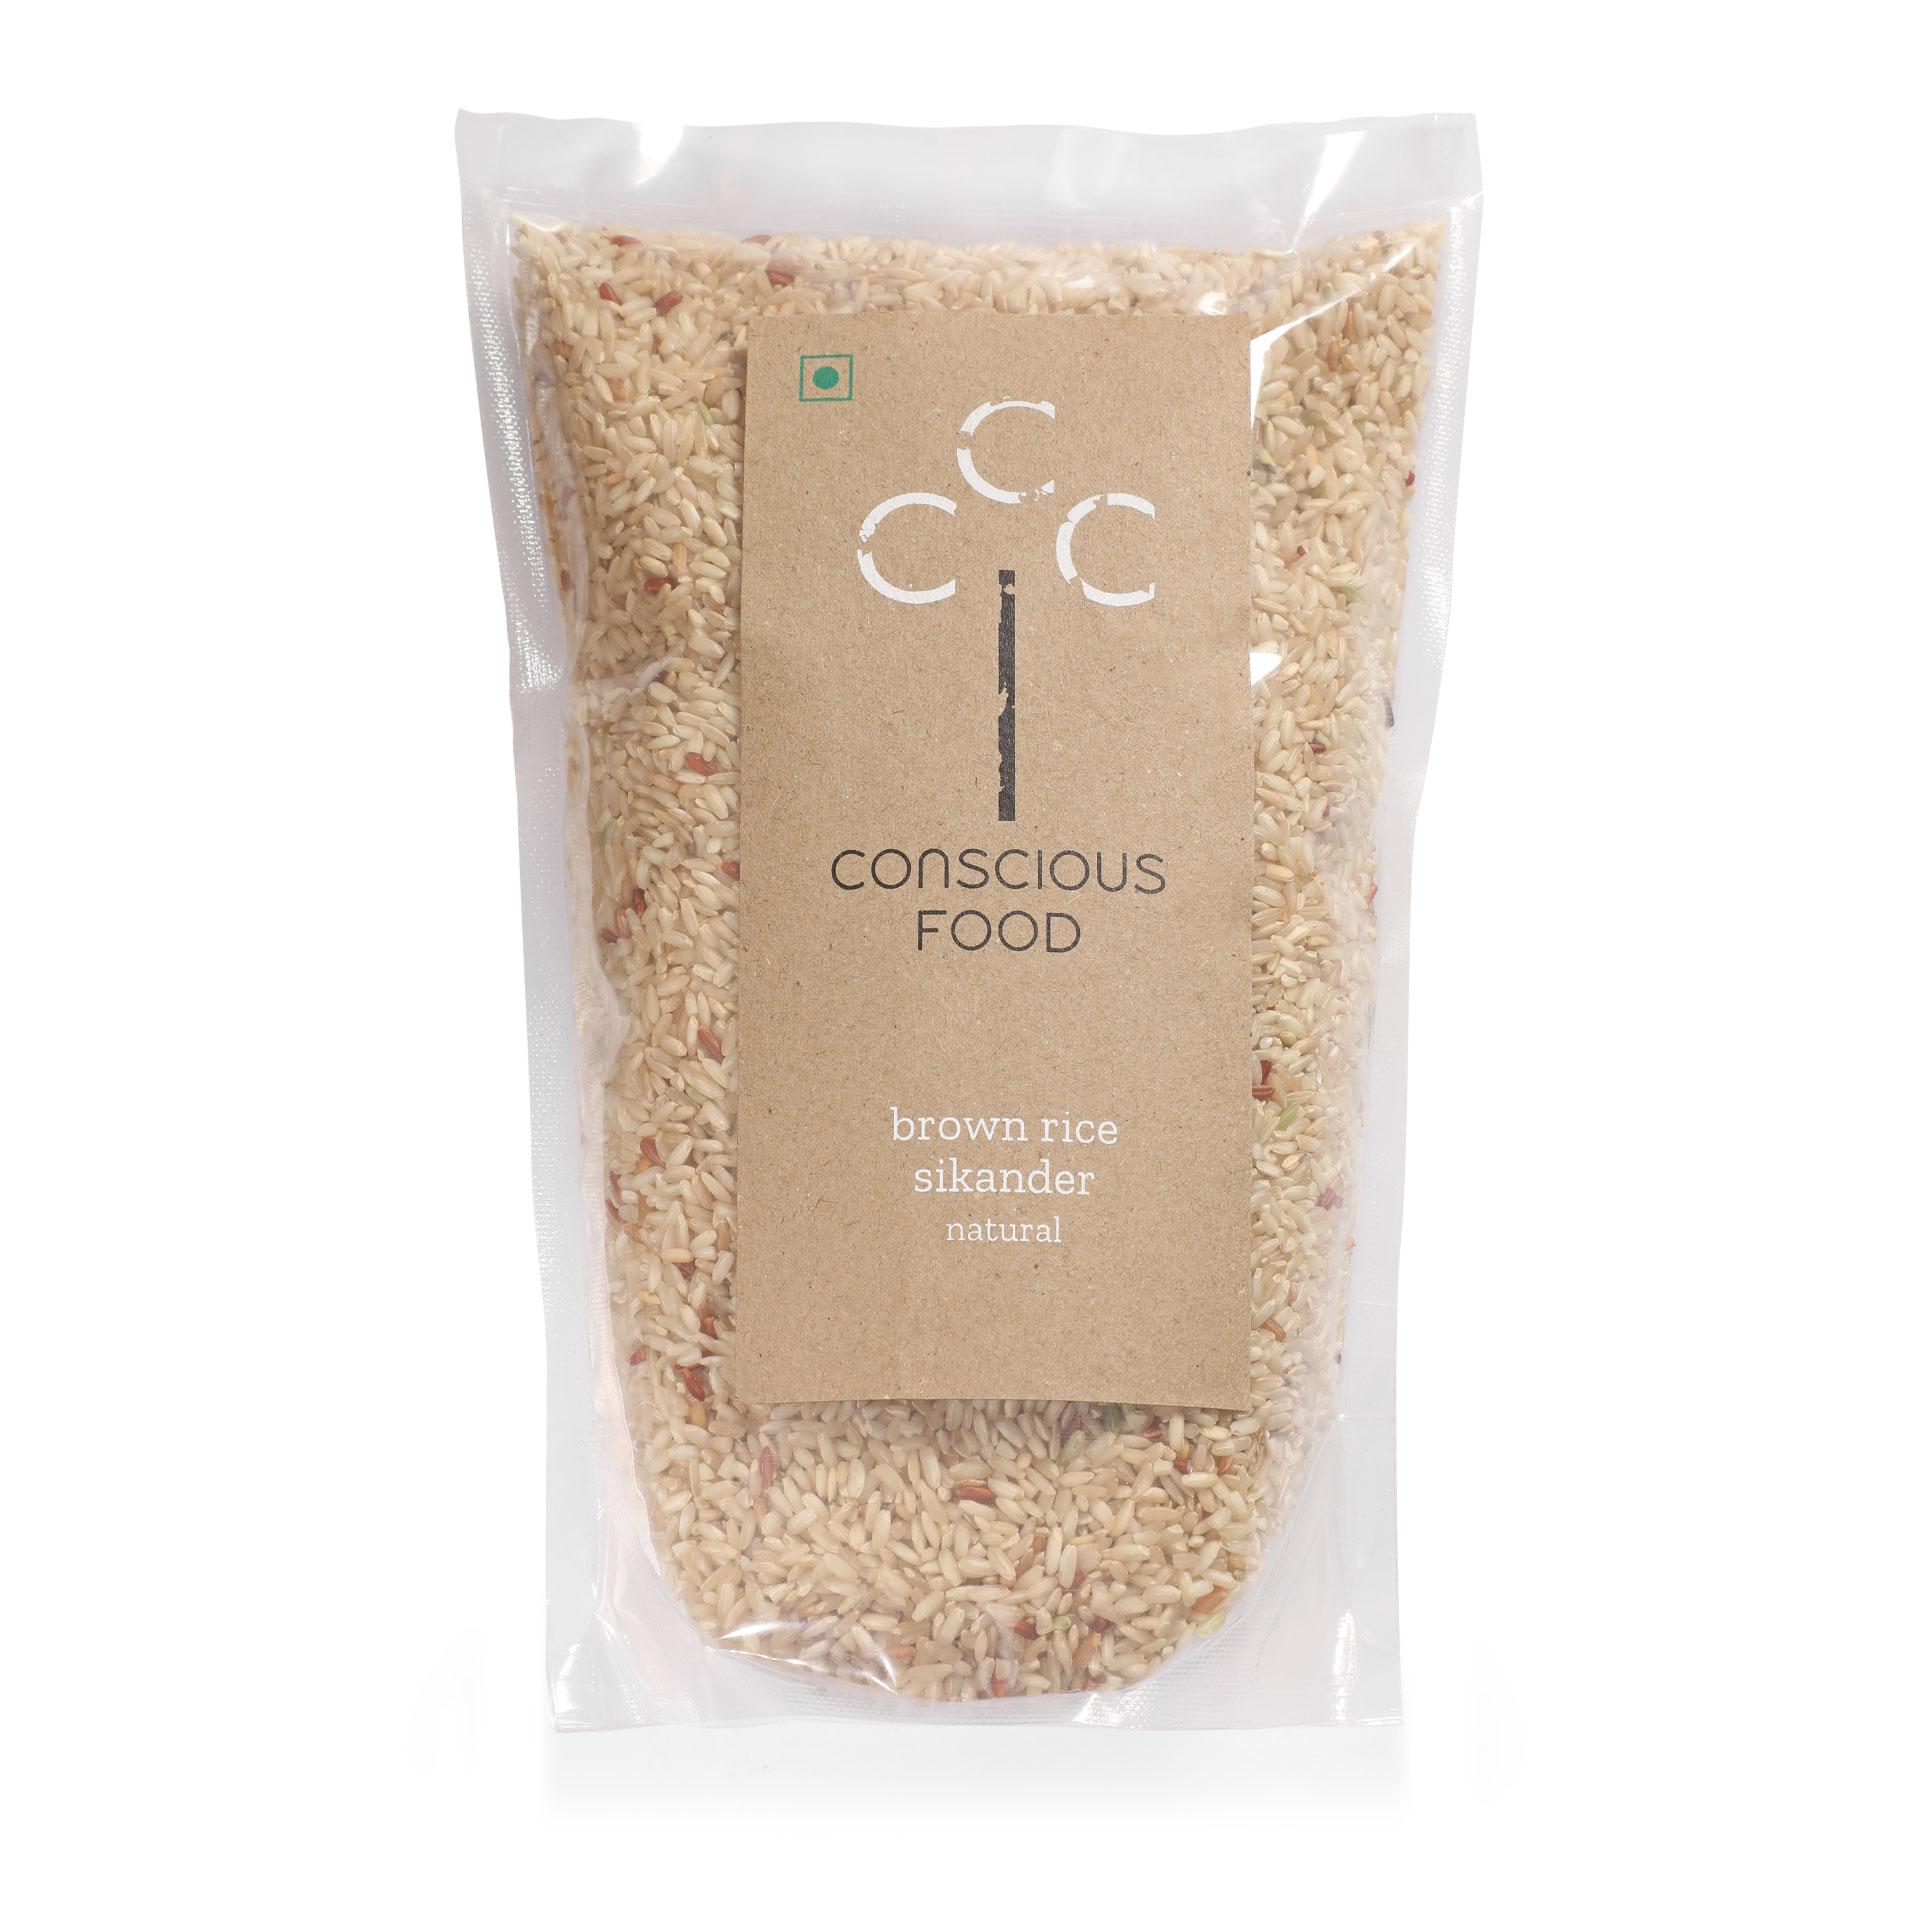 Conscious Food Natural Brown Rice (Sikander) 1 kg